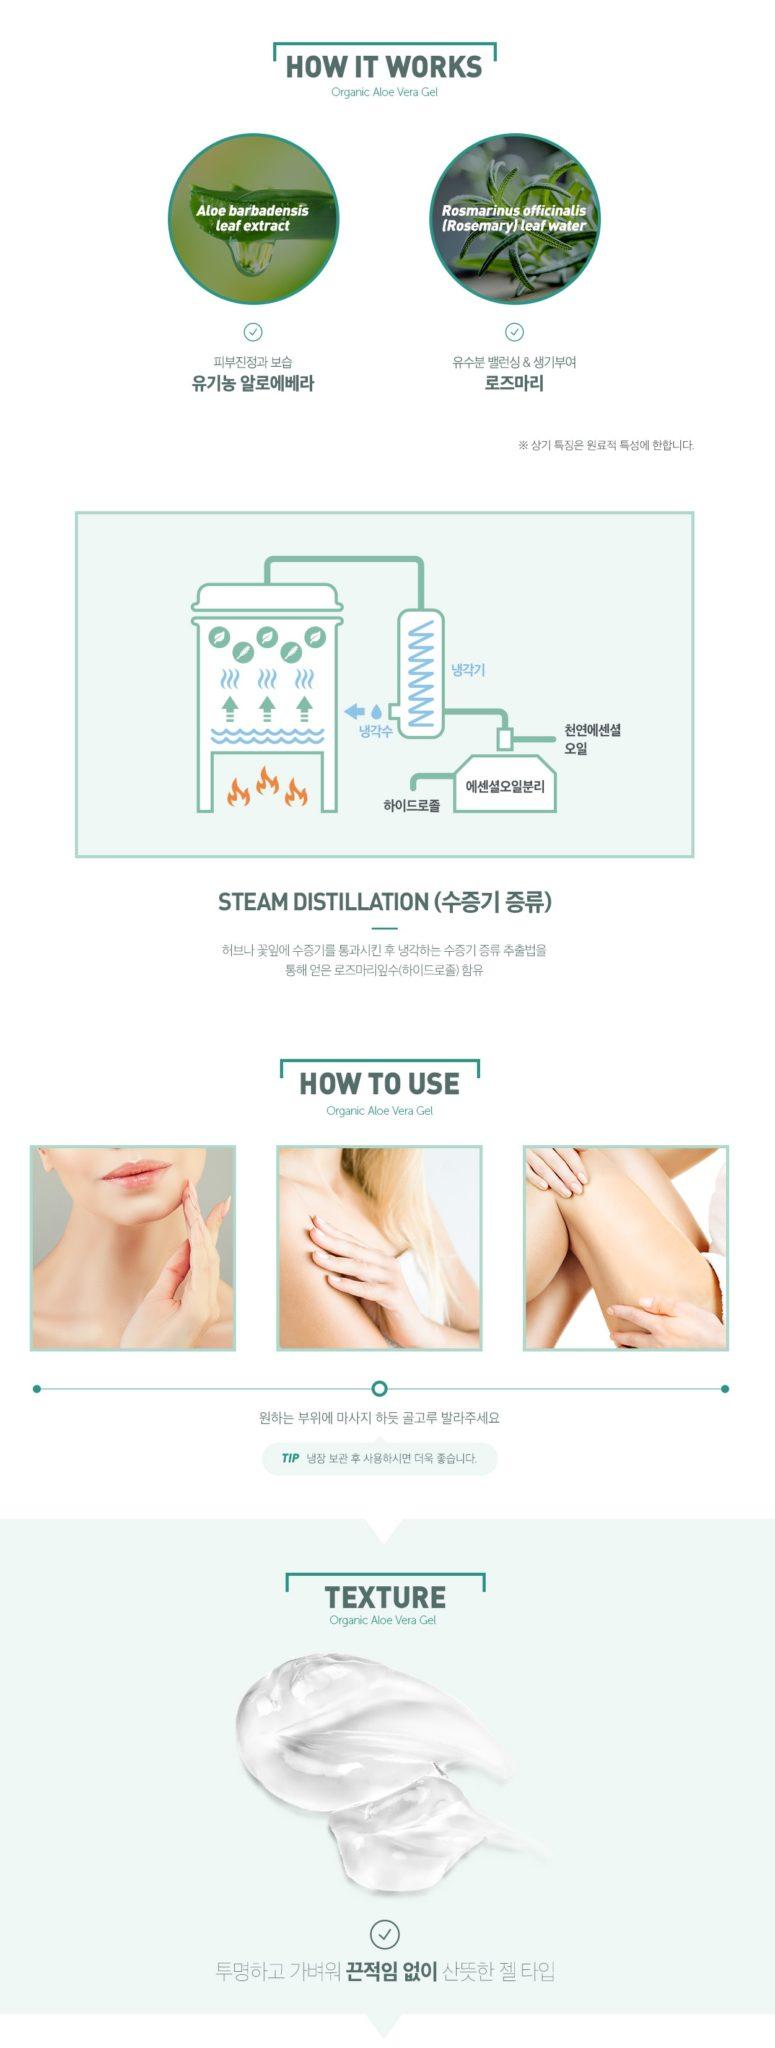 Aromatica 95% Organic Aloe Vera Gel korean cosmetic bodyhair product online shop malaysia vietnam macau2